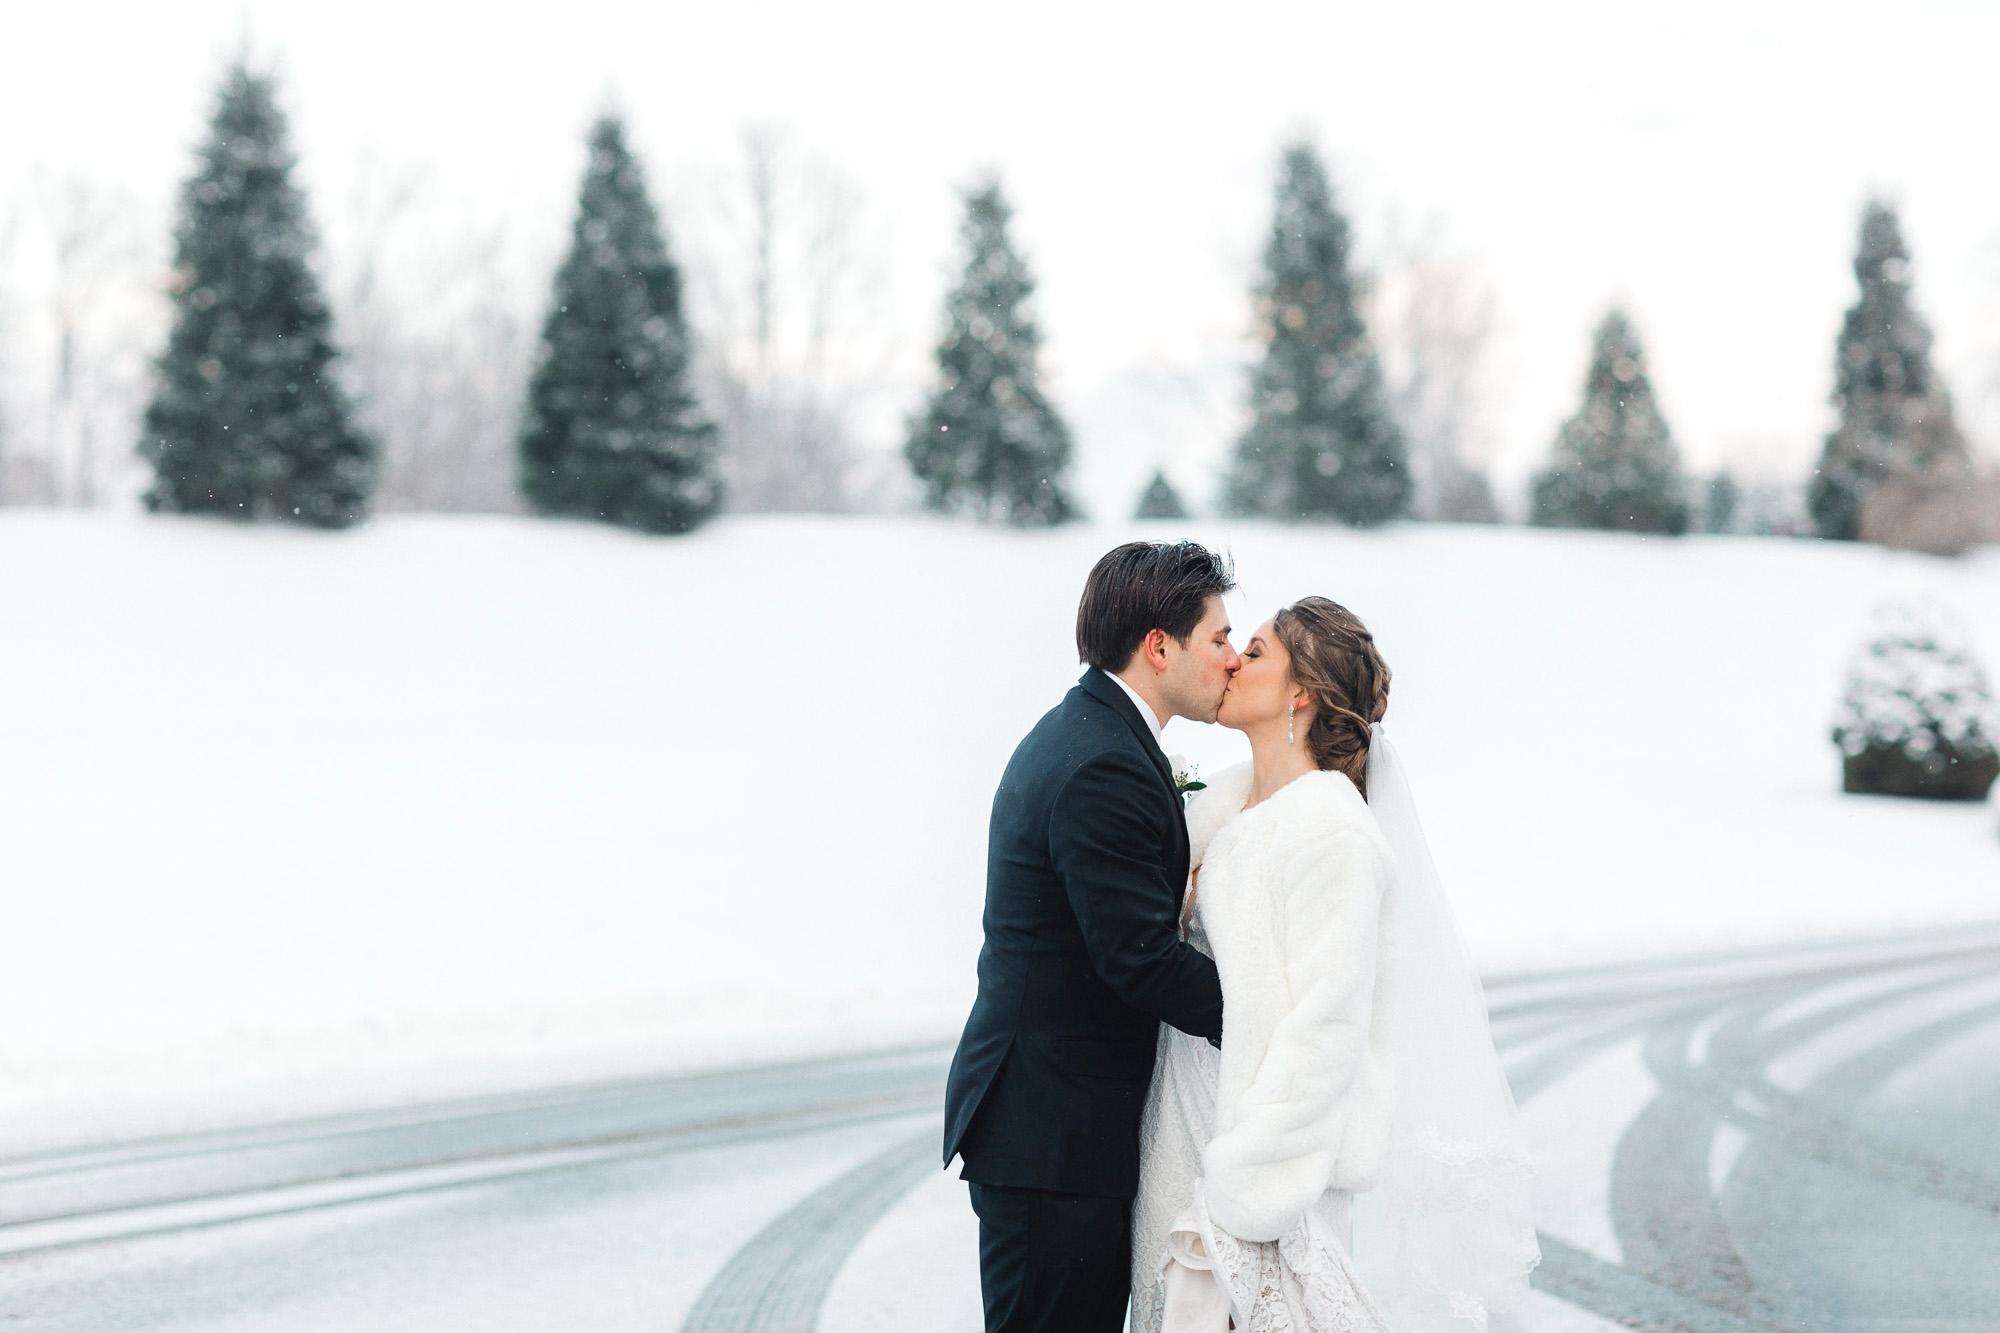 snowy-sand-springs-country-club-drums-pa-christmas-wedding-24792.jpg